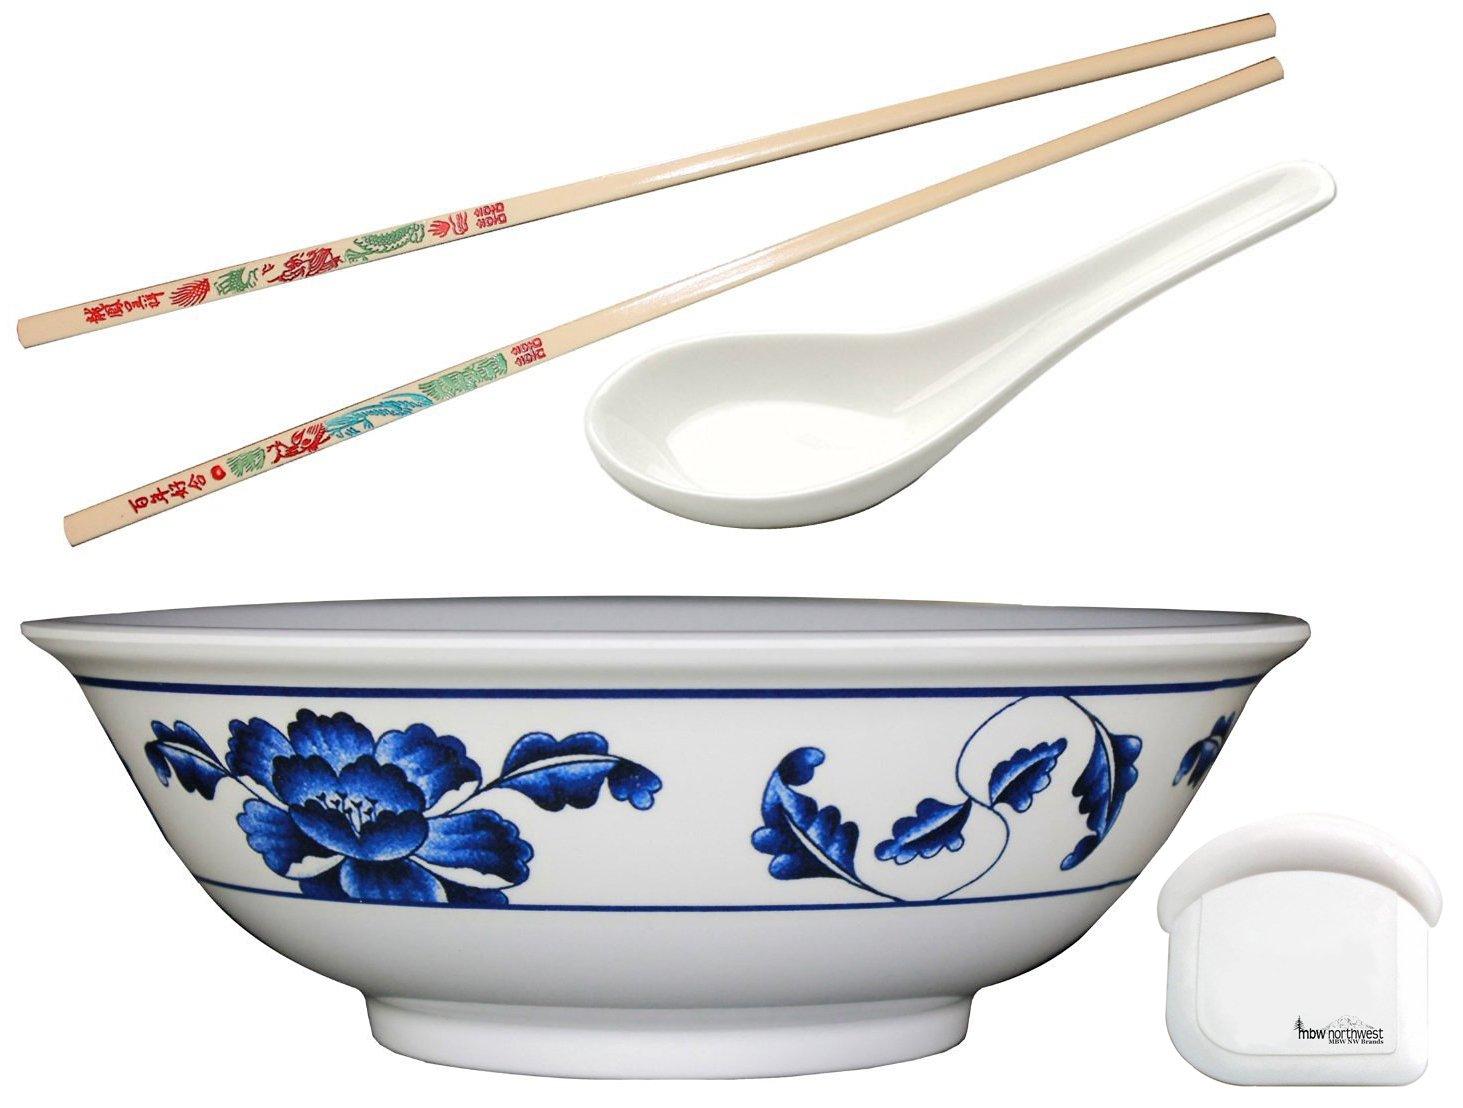 Pho Rice / Noodle Melamine Soup Bowl Set with Pan Scraper, 57 Ounce, 9.75 Inch, Includes 1 Pair of Chopsticks and 1 Oriental Soup Spoon, Pho size: Large, Design: Blue Lotus